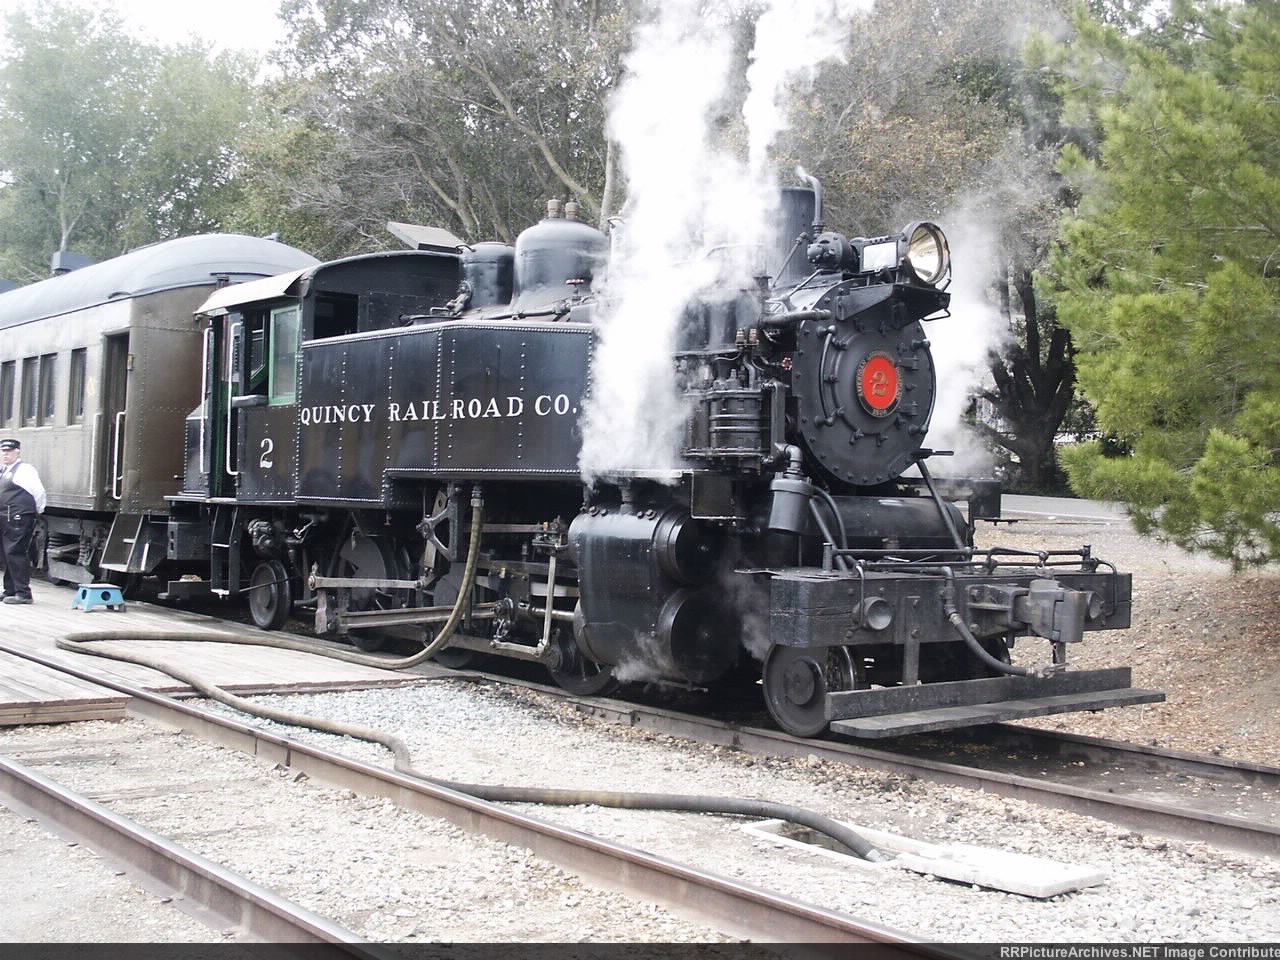 Quincy Railroad #2